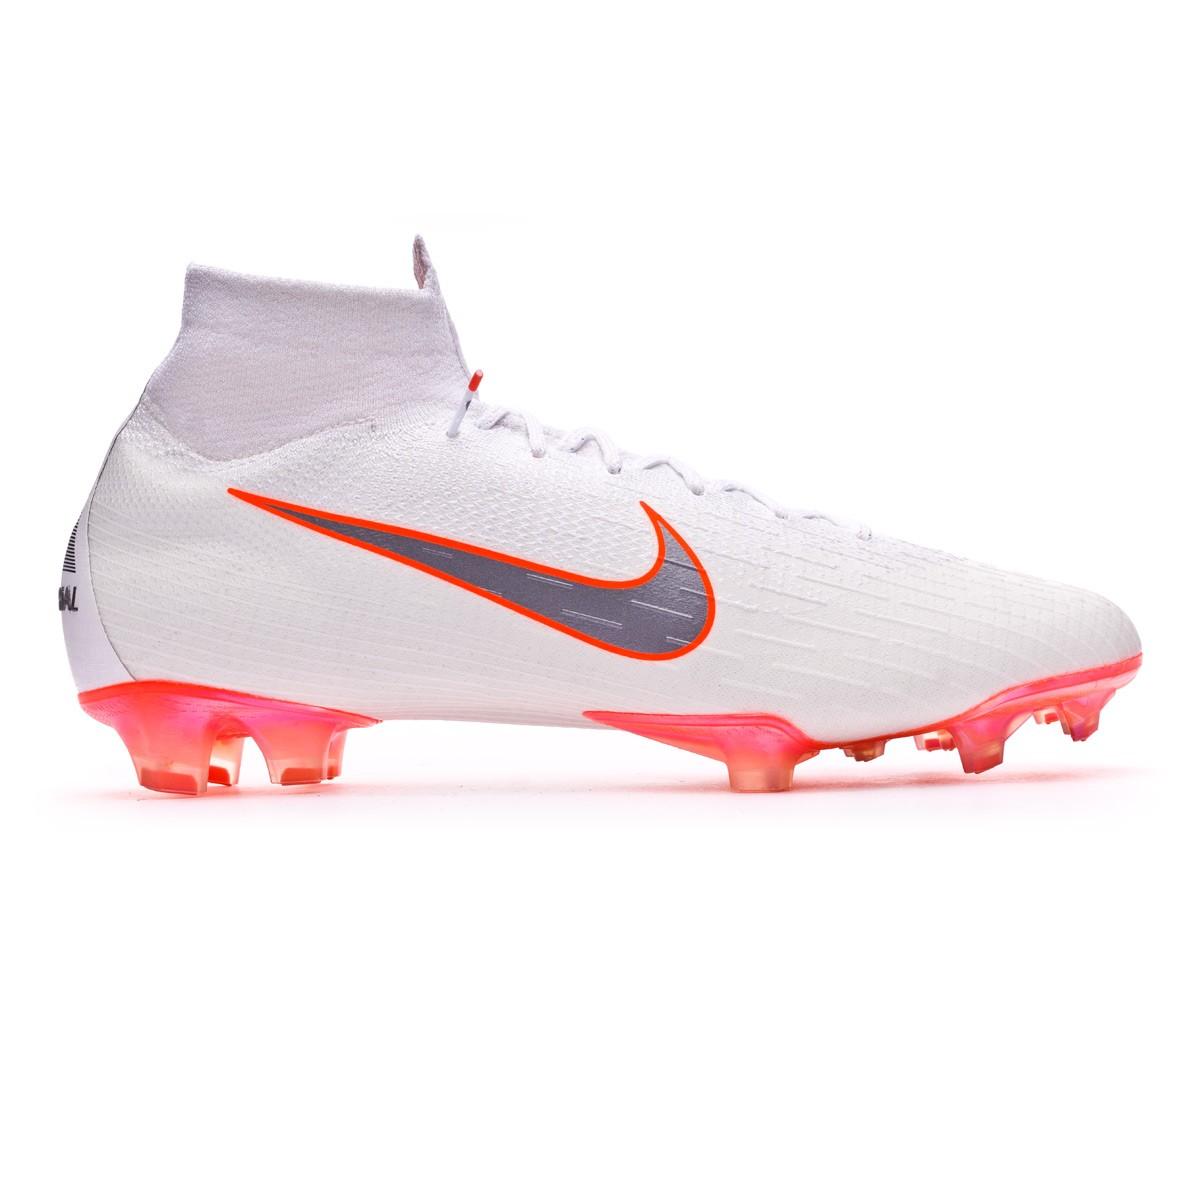 2832c1b6b366 Boot Nike Mercurial Superfly VI Elite FG White-Metallic cool grey-Total  orange - Leaked soccer